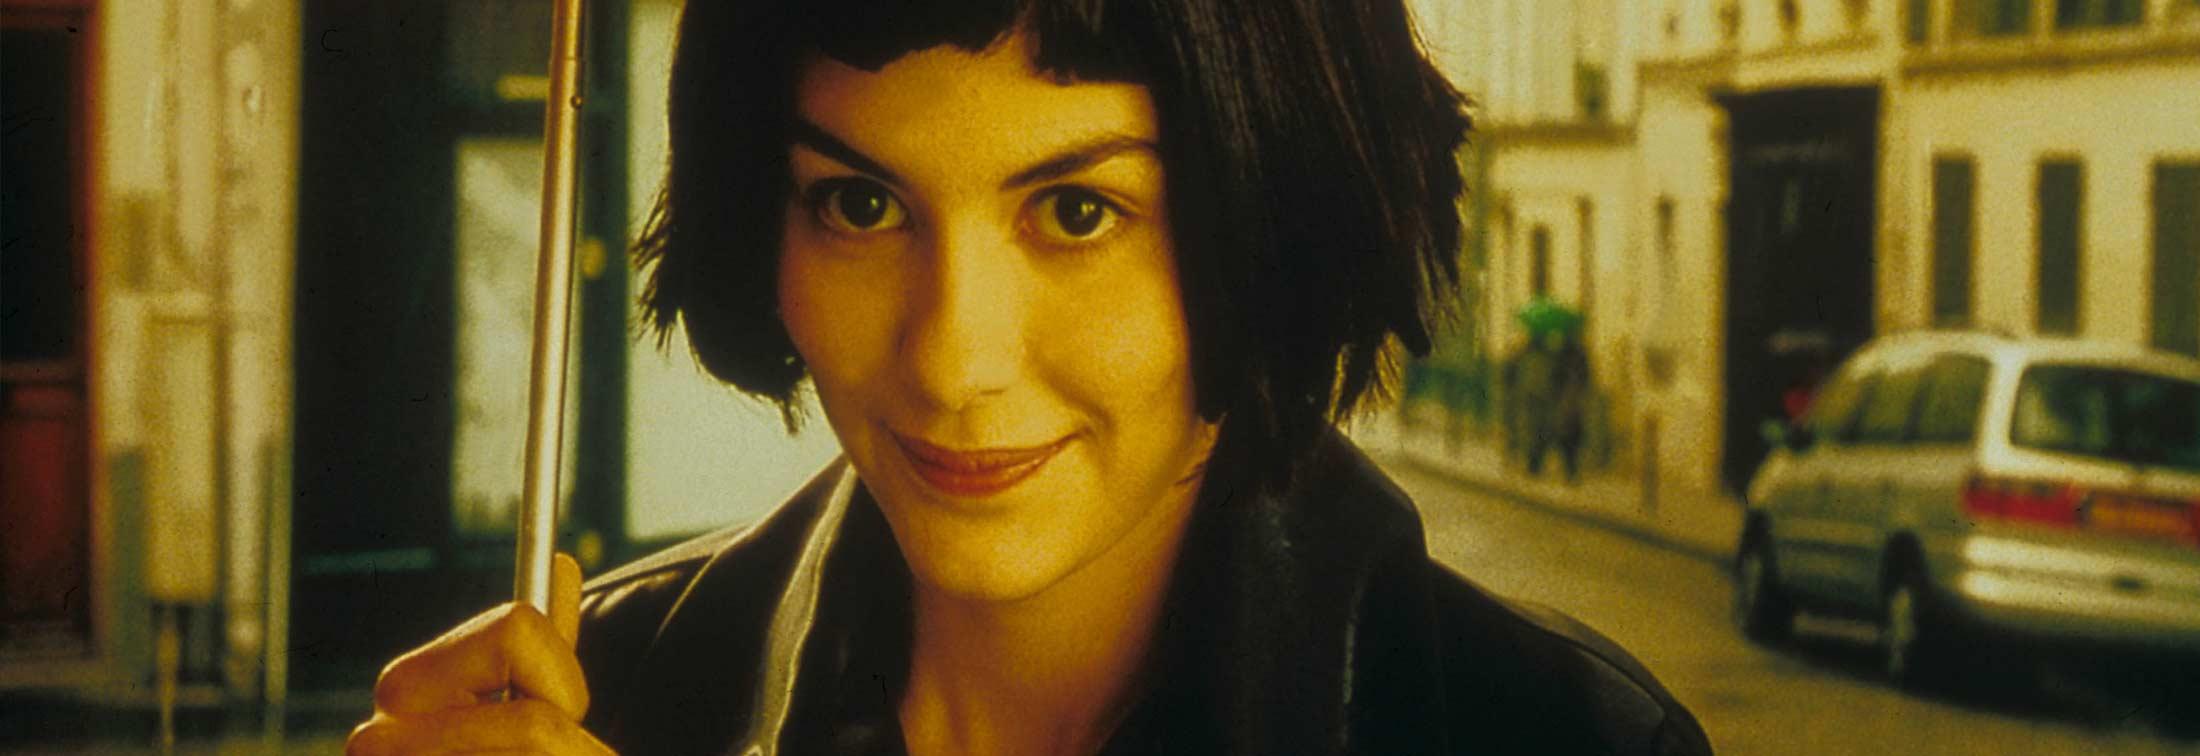 Amélie - The perfect companion piece to 'Soul' for a life of joy